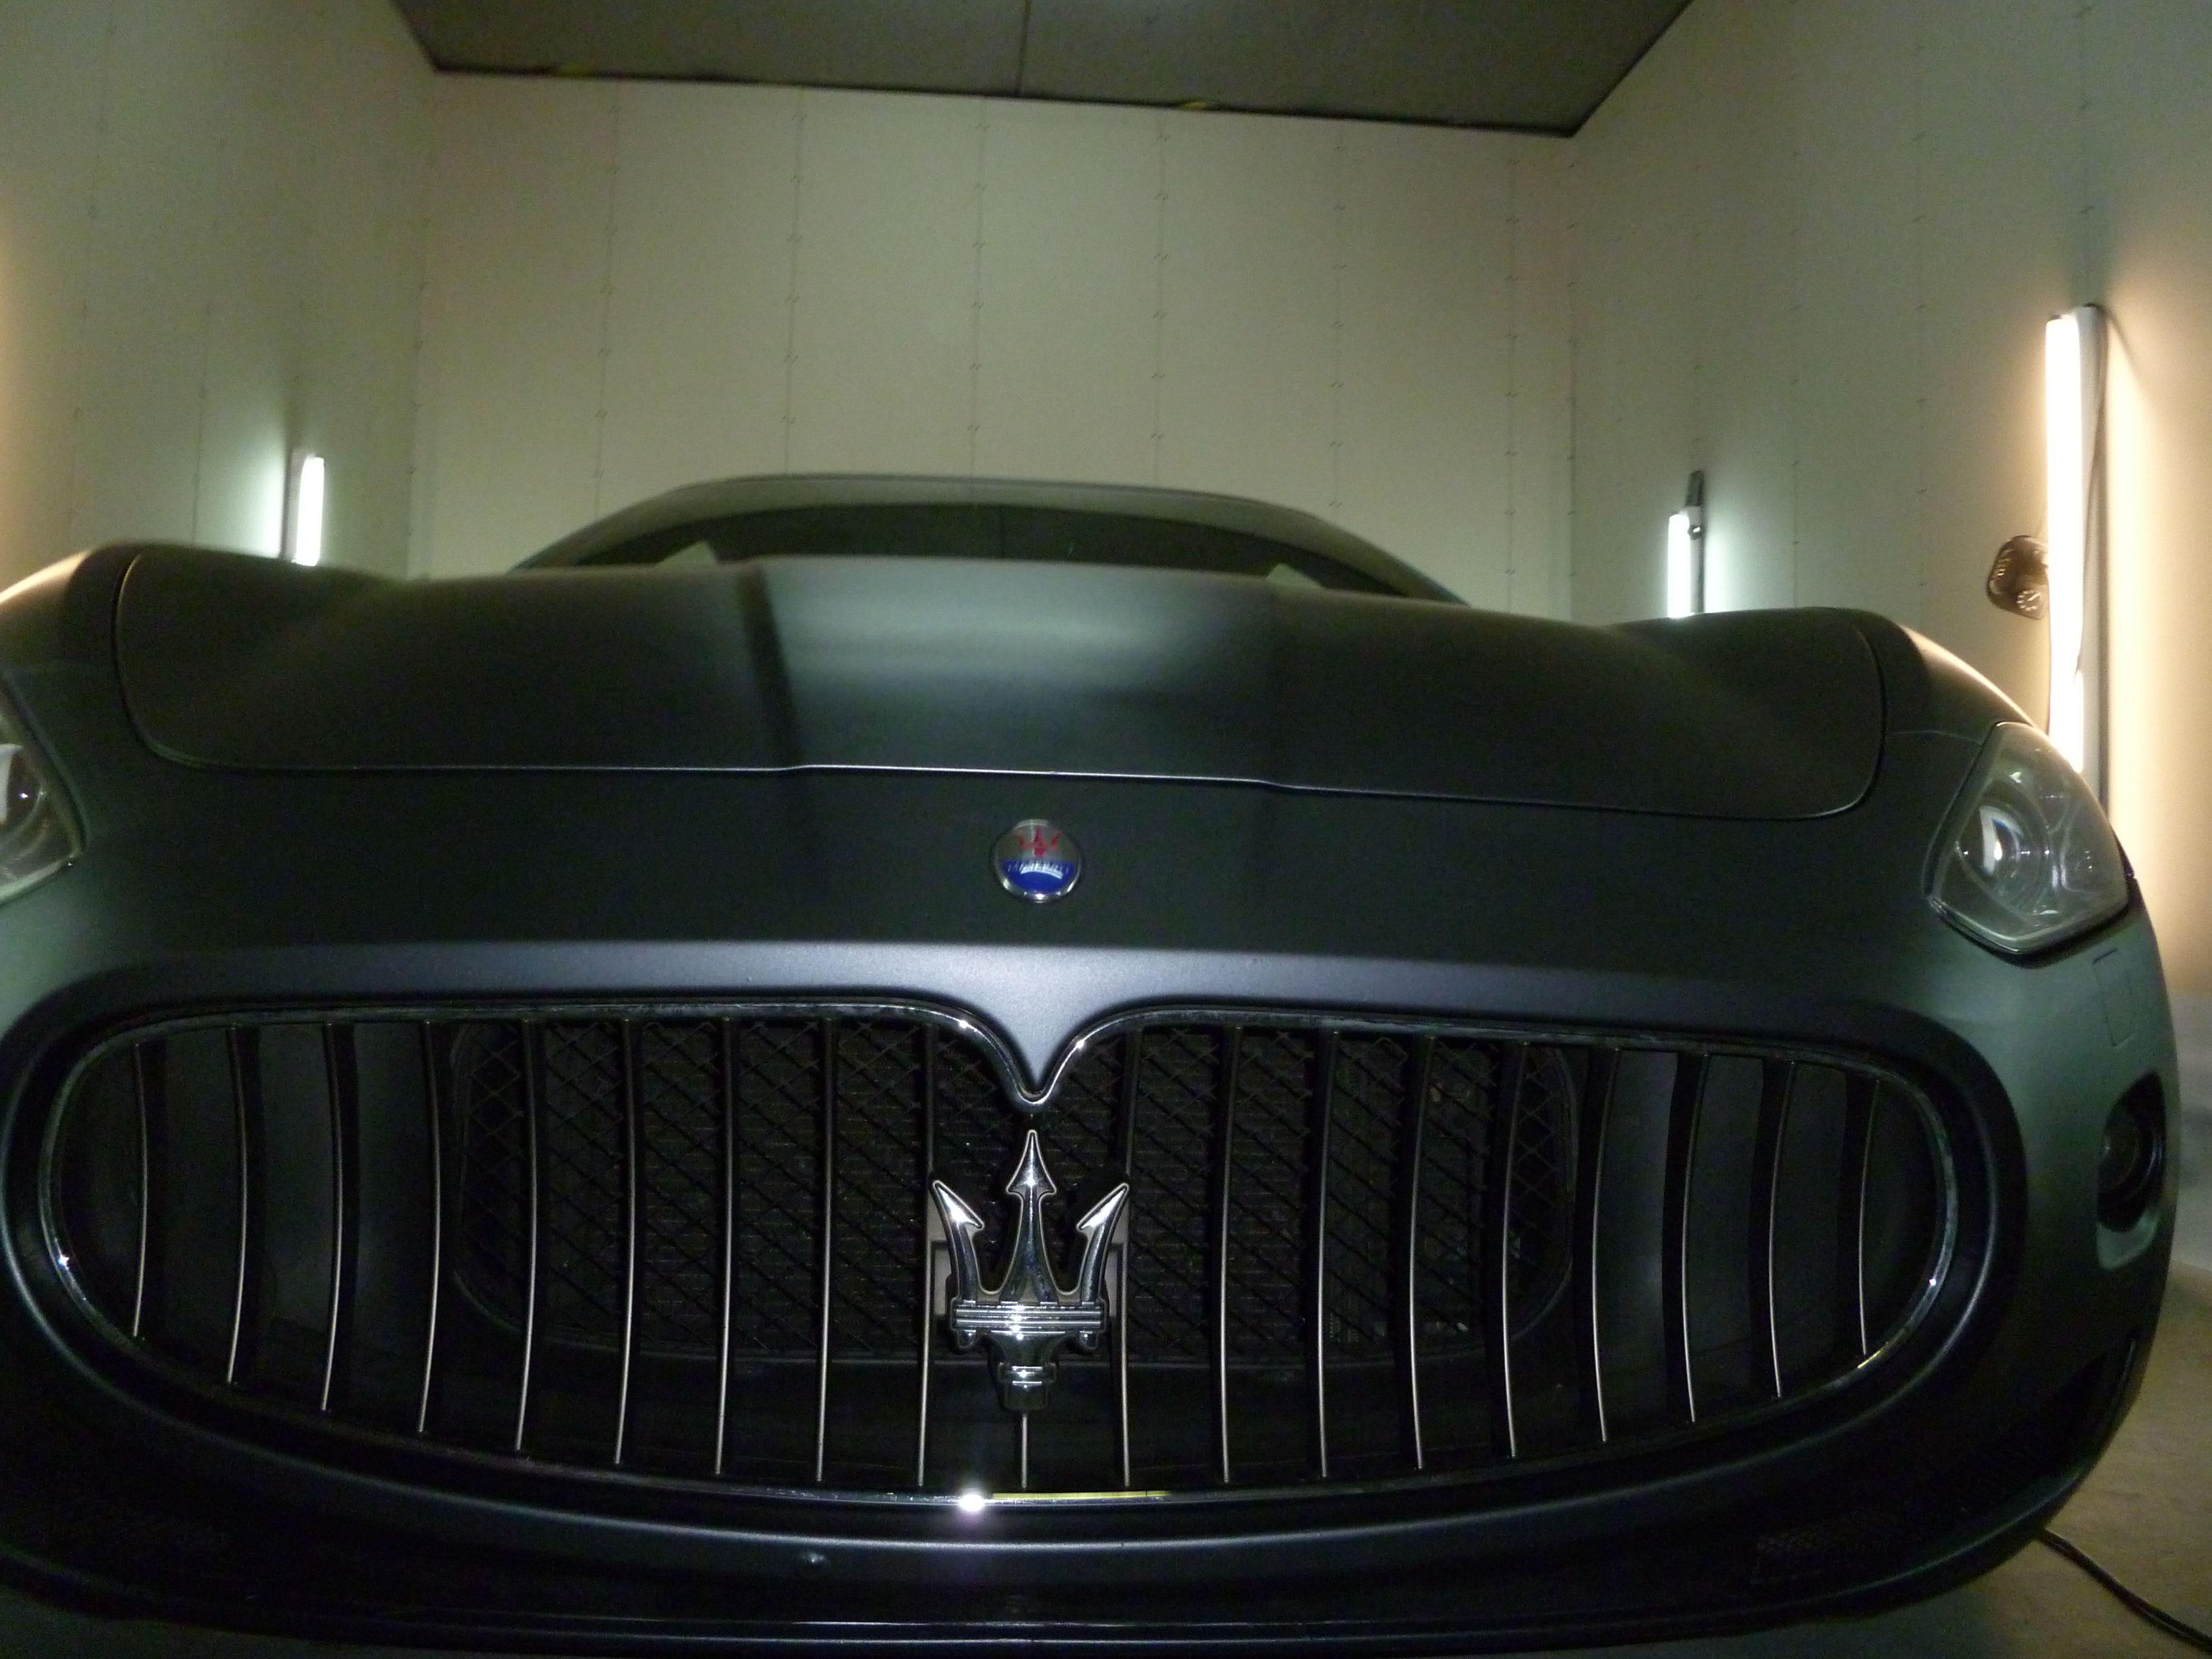 Maserati Gran Turismo met Mat Zwarte Wrap, Carwrapping door Wrapmyride.nu Foto-nr:6055, ©2020